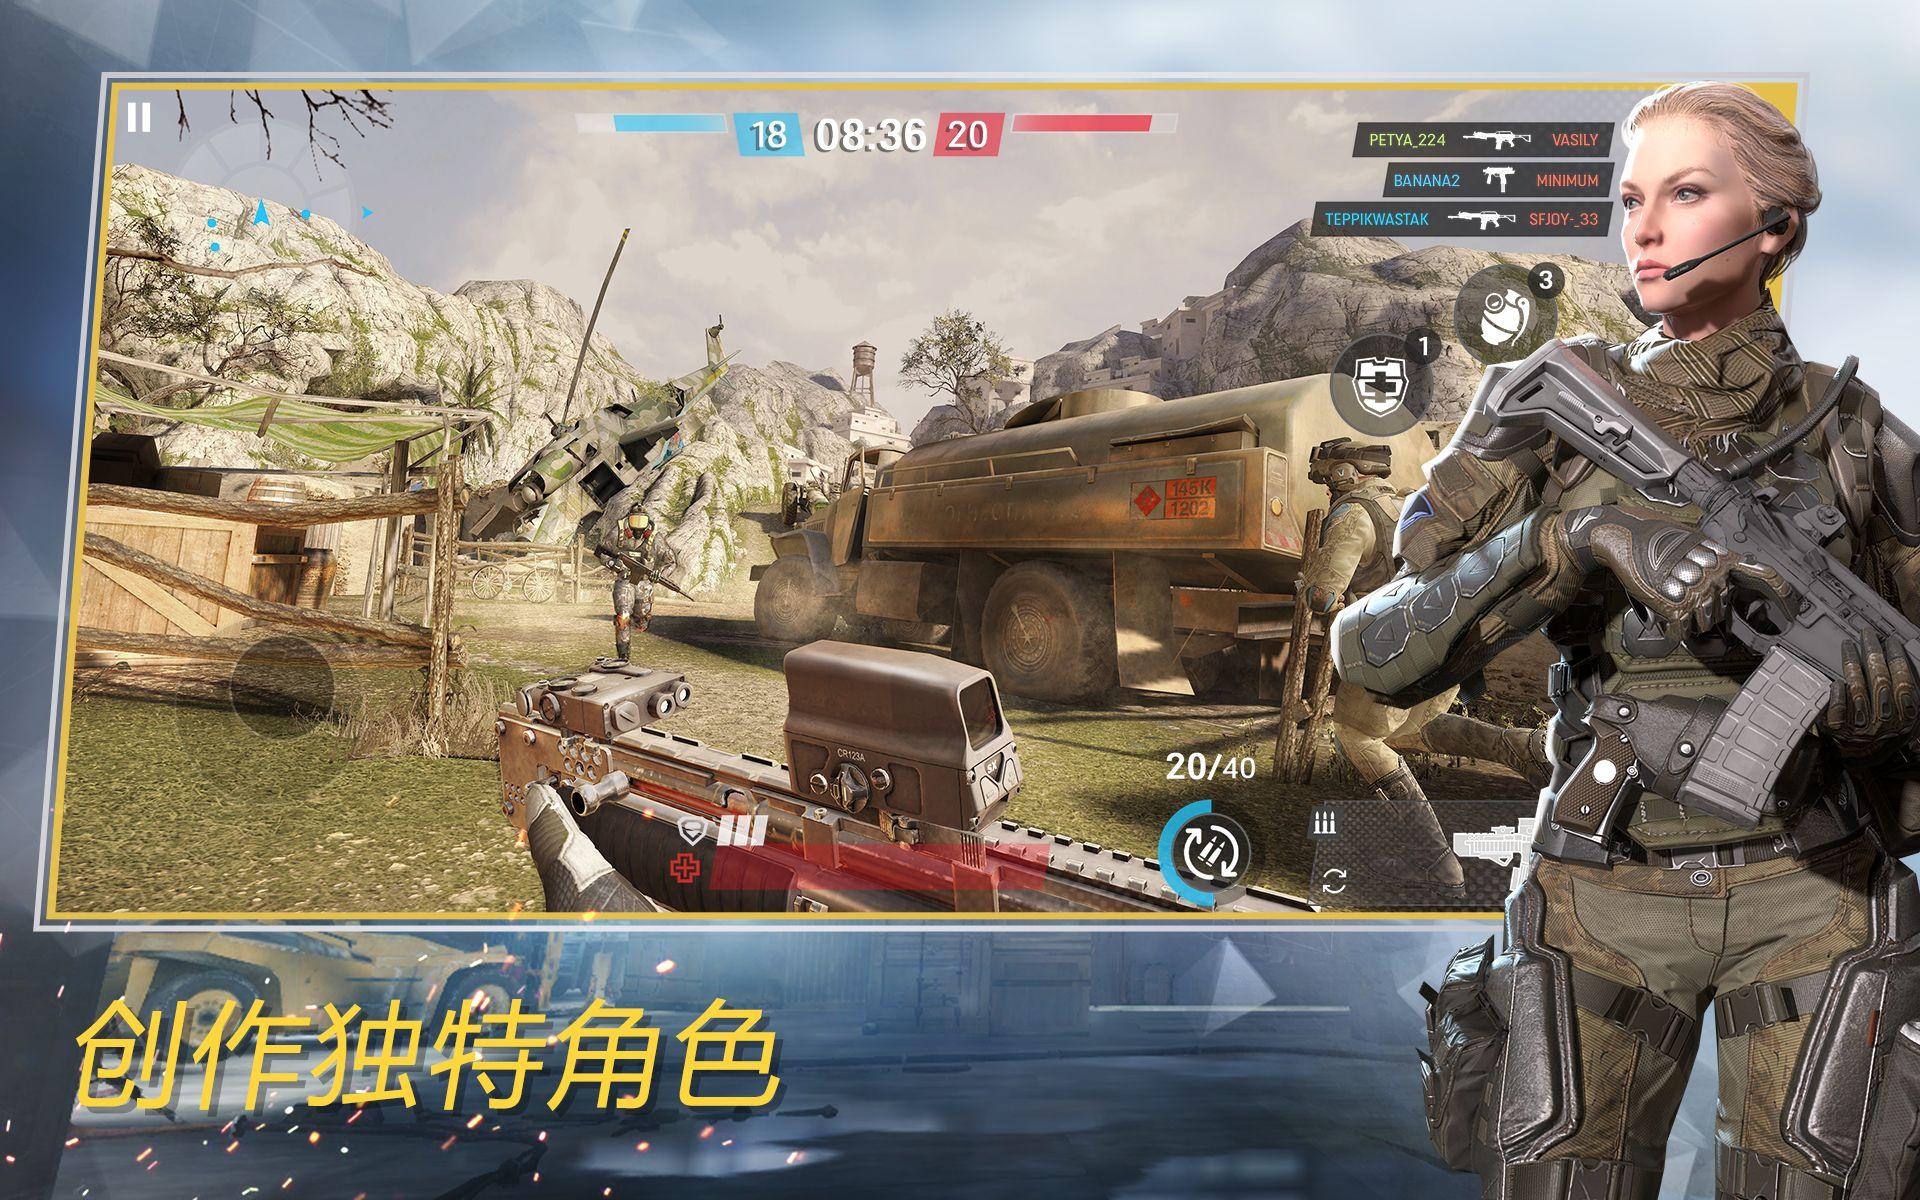 Warface: Global Operations: 第一人称动作射击游戏 游戏截图4